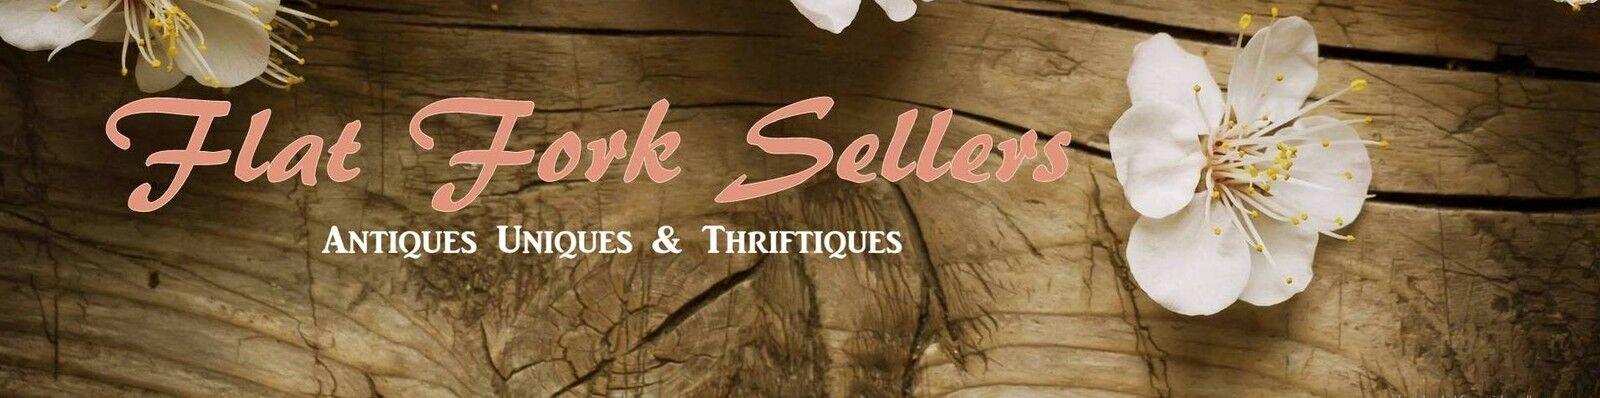 Flat Fork Sellers